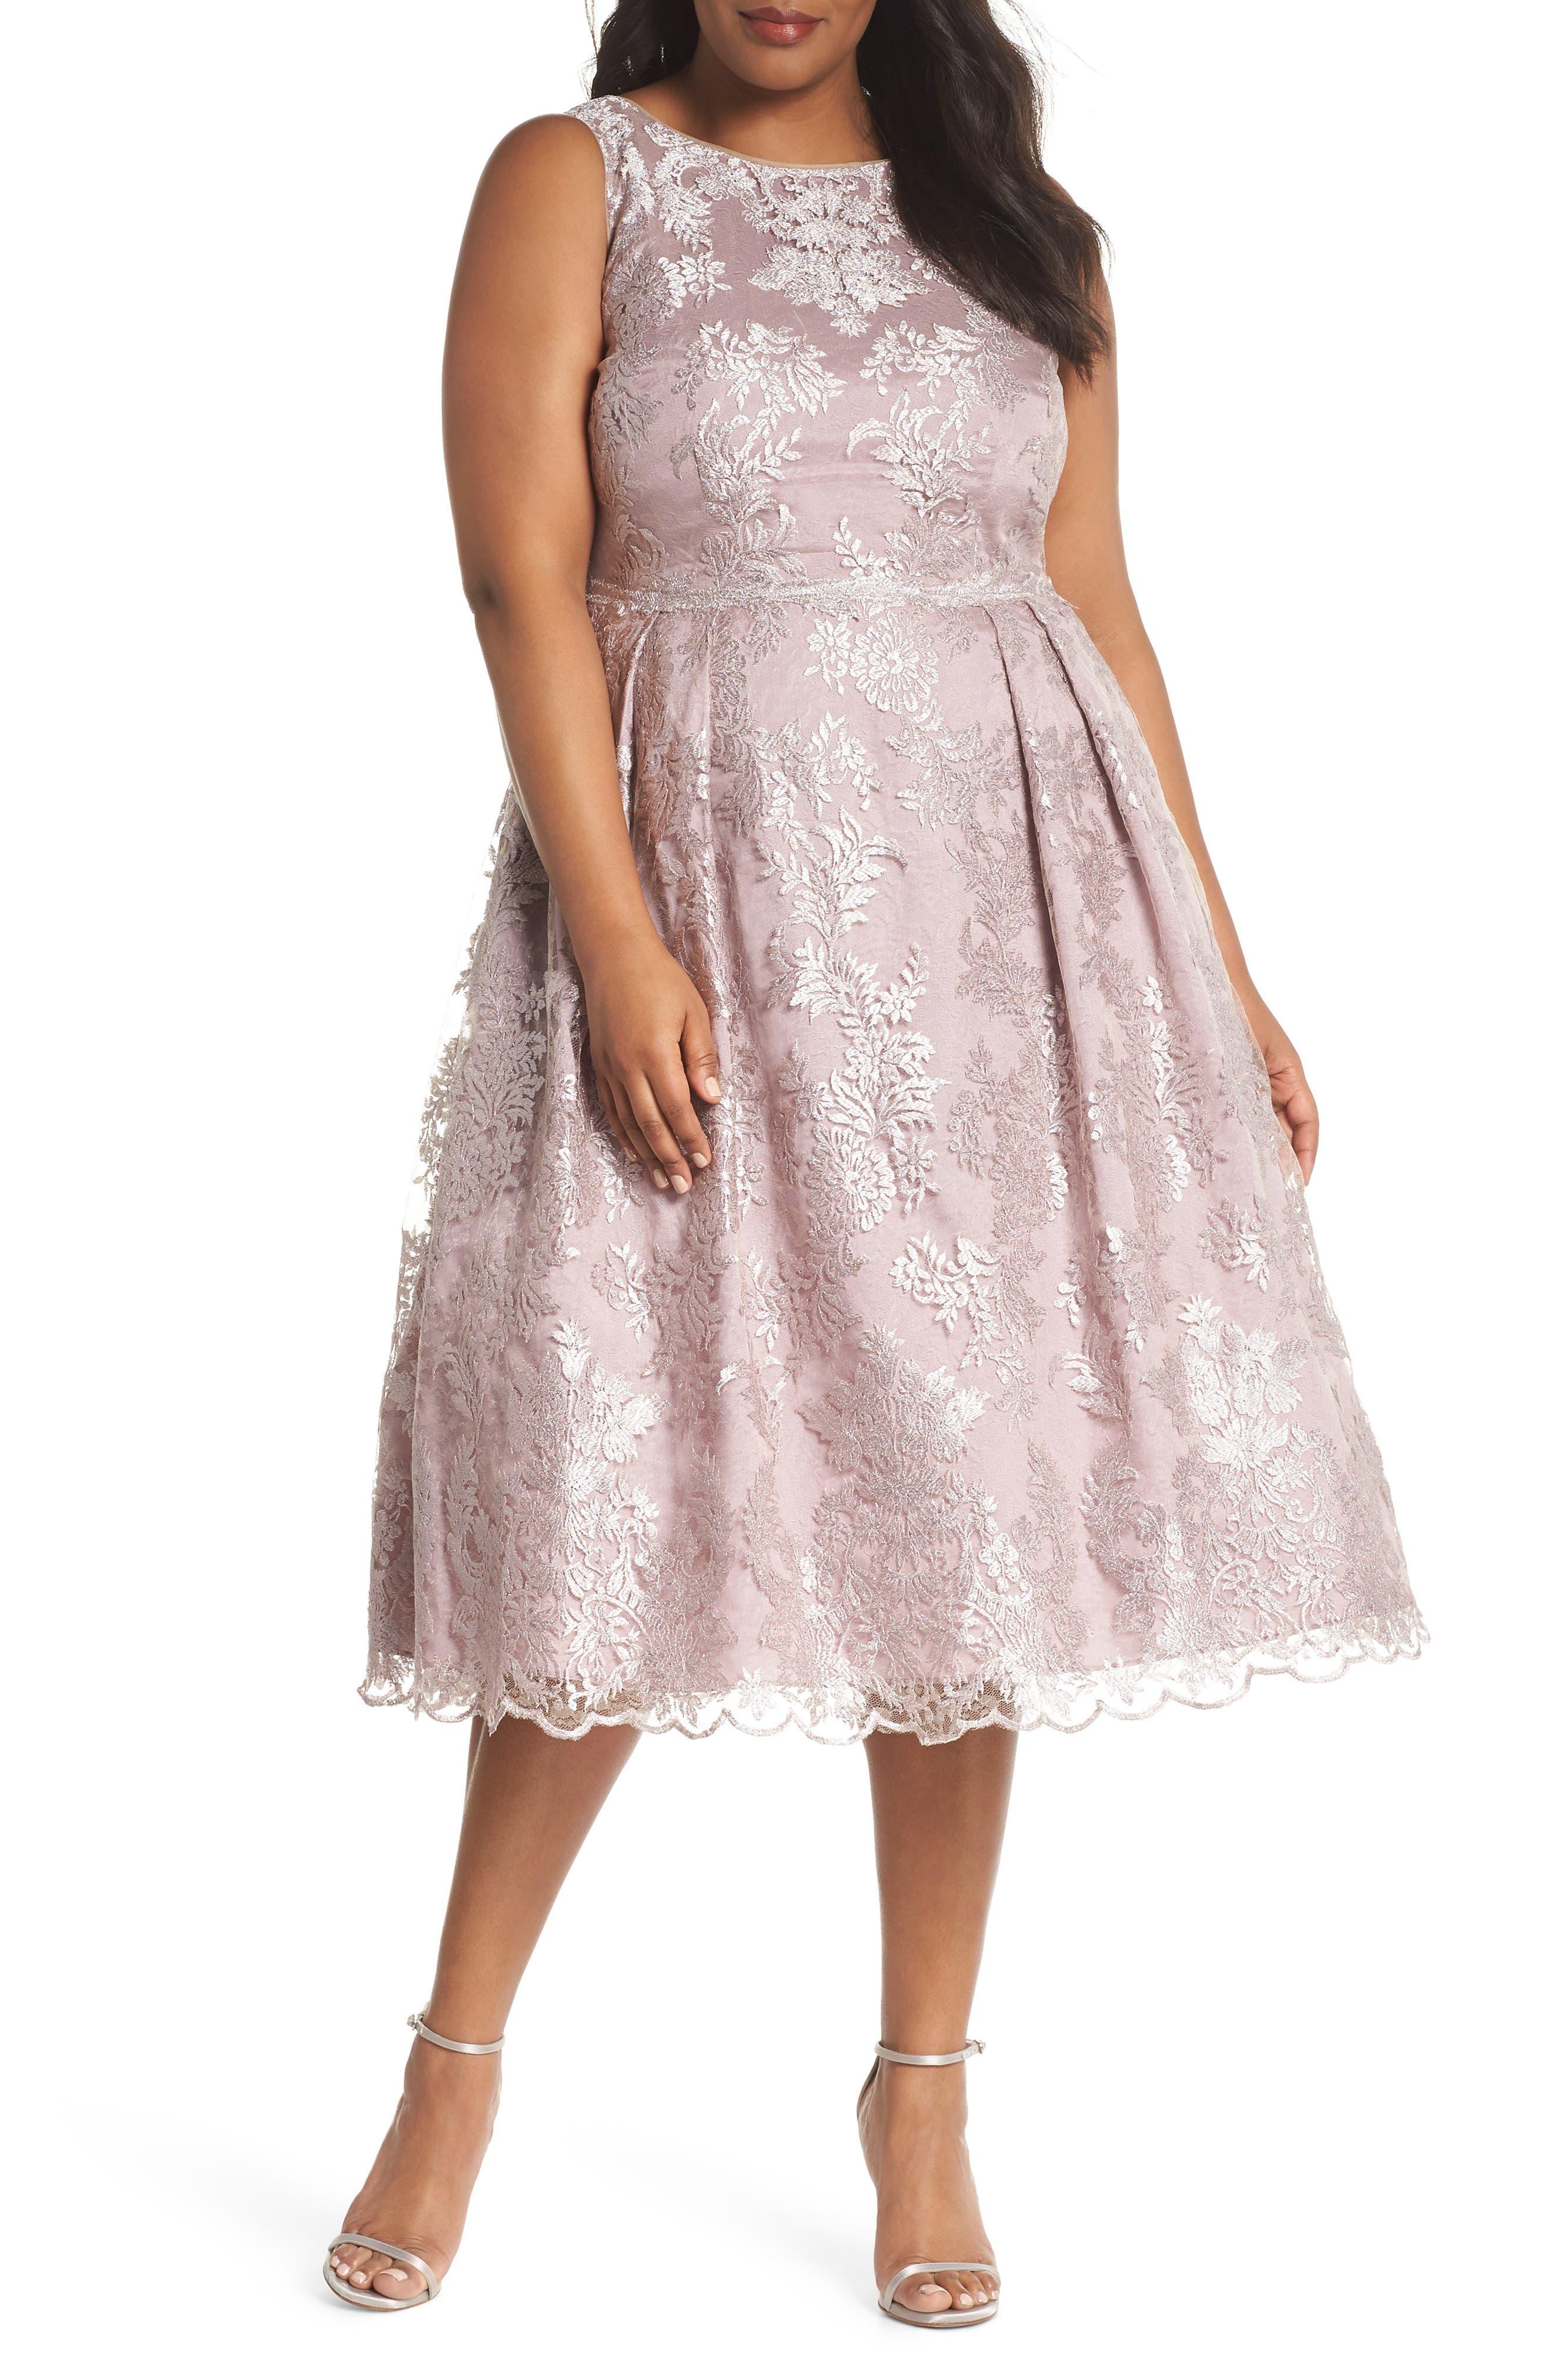 Adrianna Papell Metallic Embroidered Tea Length Dress (Plus Size)